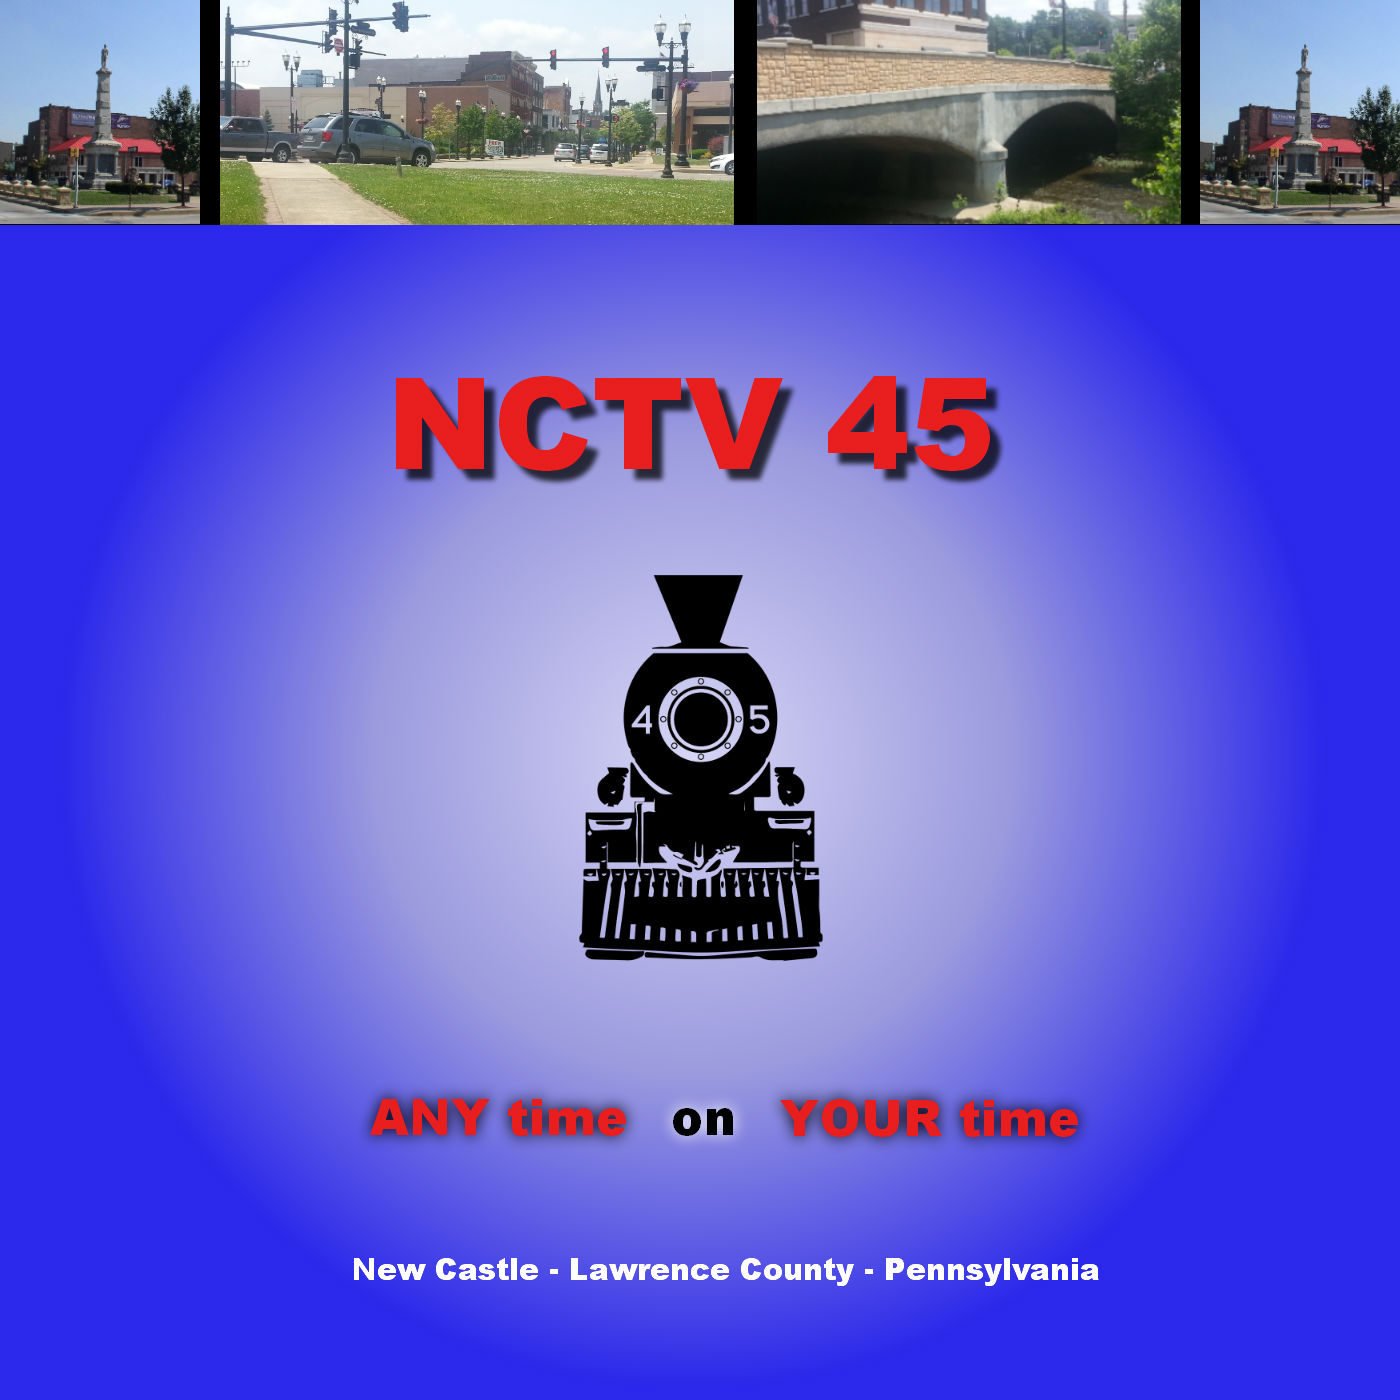 Artwork for NCTV45 NewsWatch NewsBrief Job Fair Expo April 15 2019